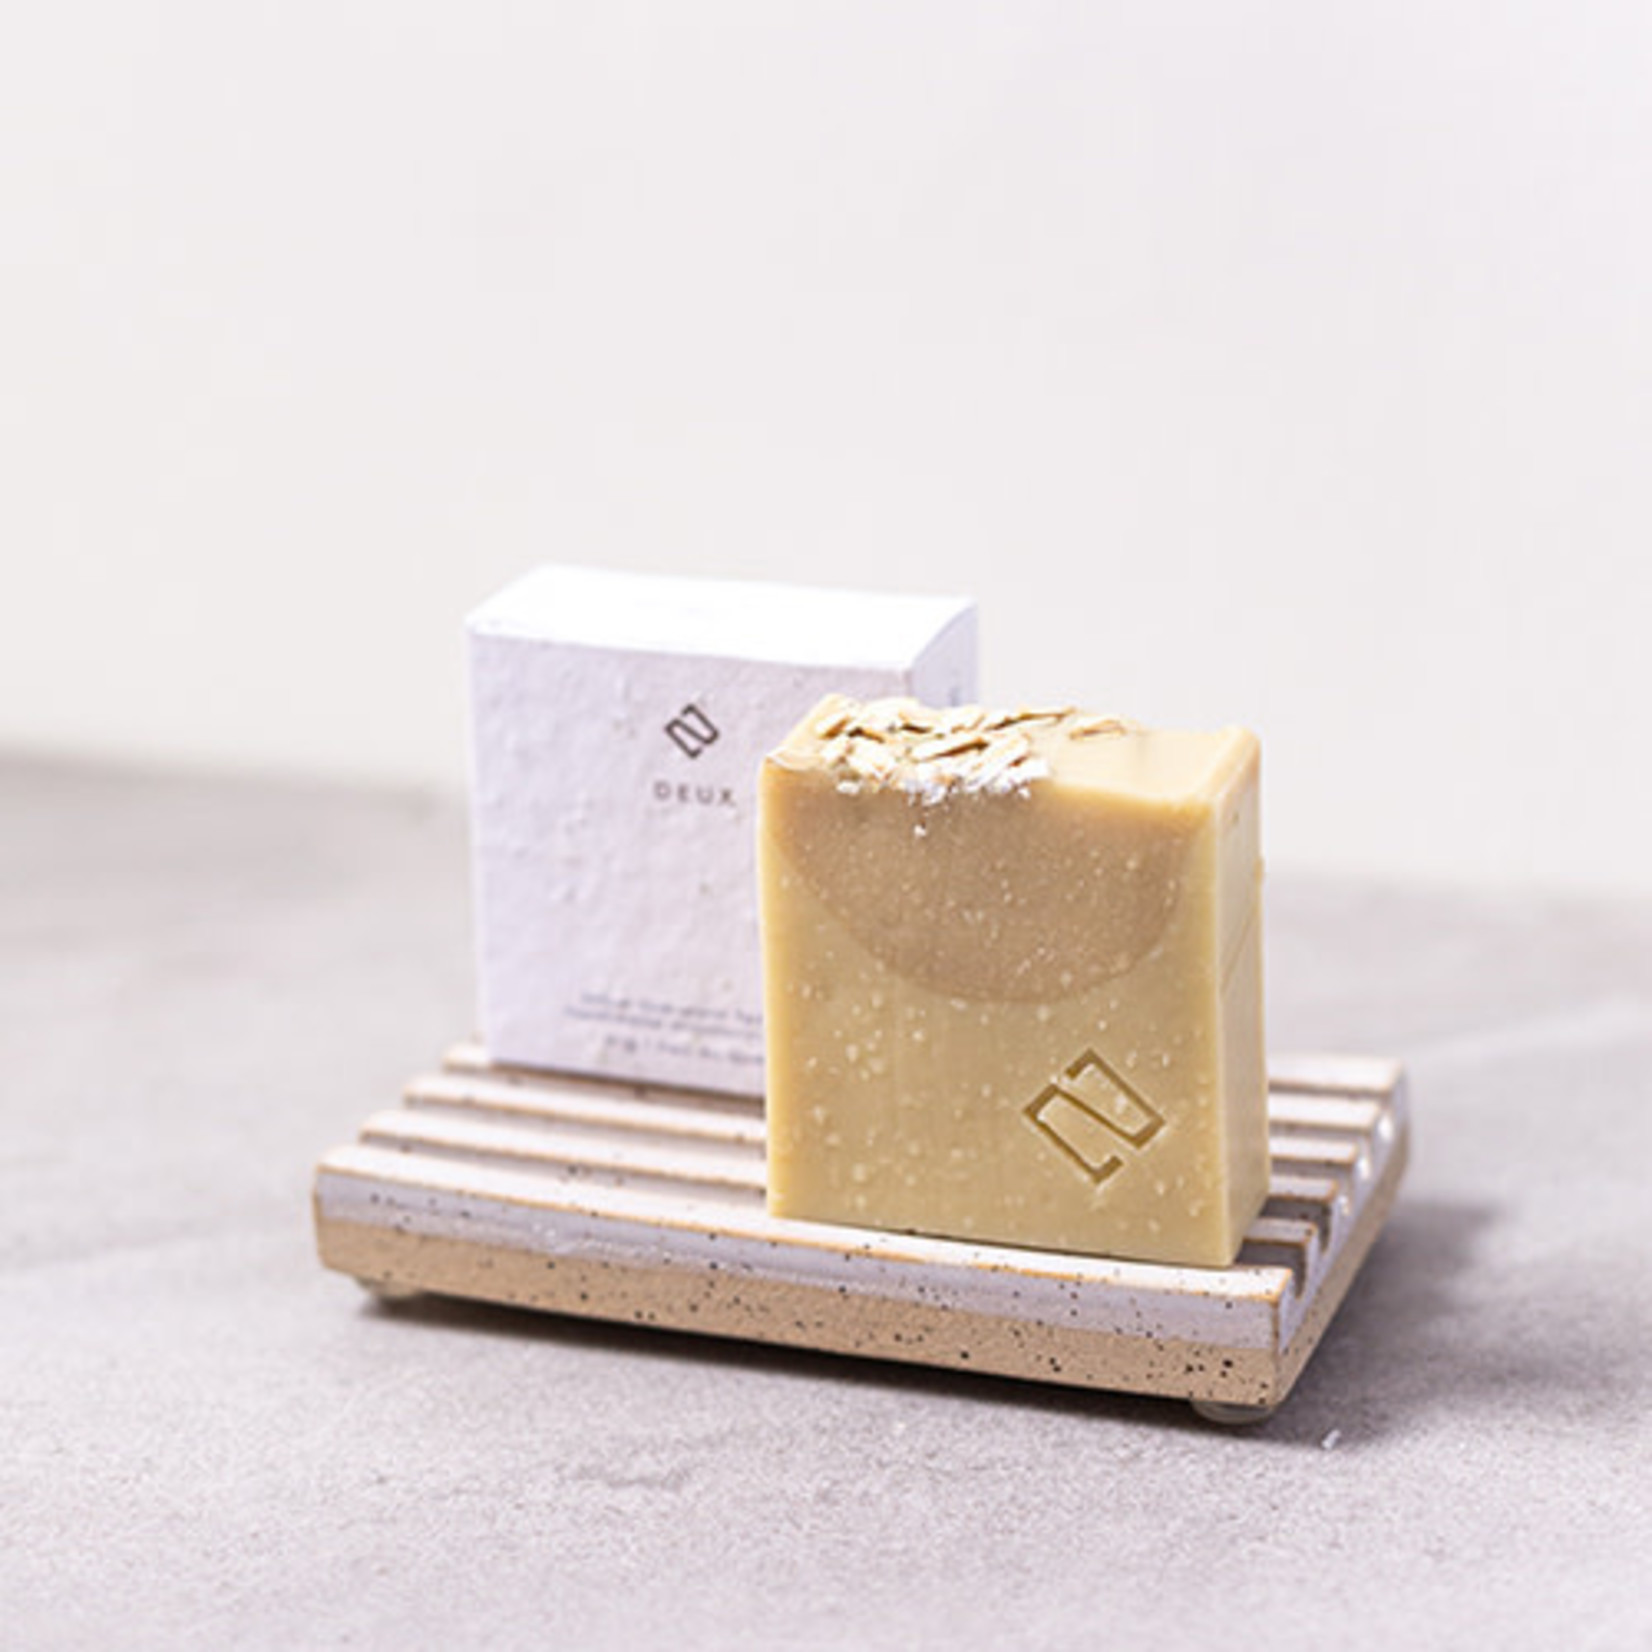 Deux cosmetiques OATMEAL AND VANILLA SOAP